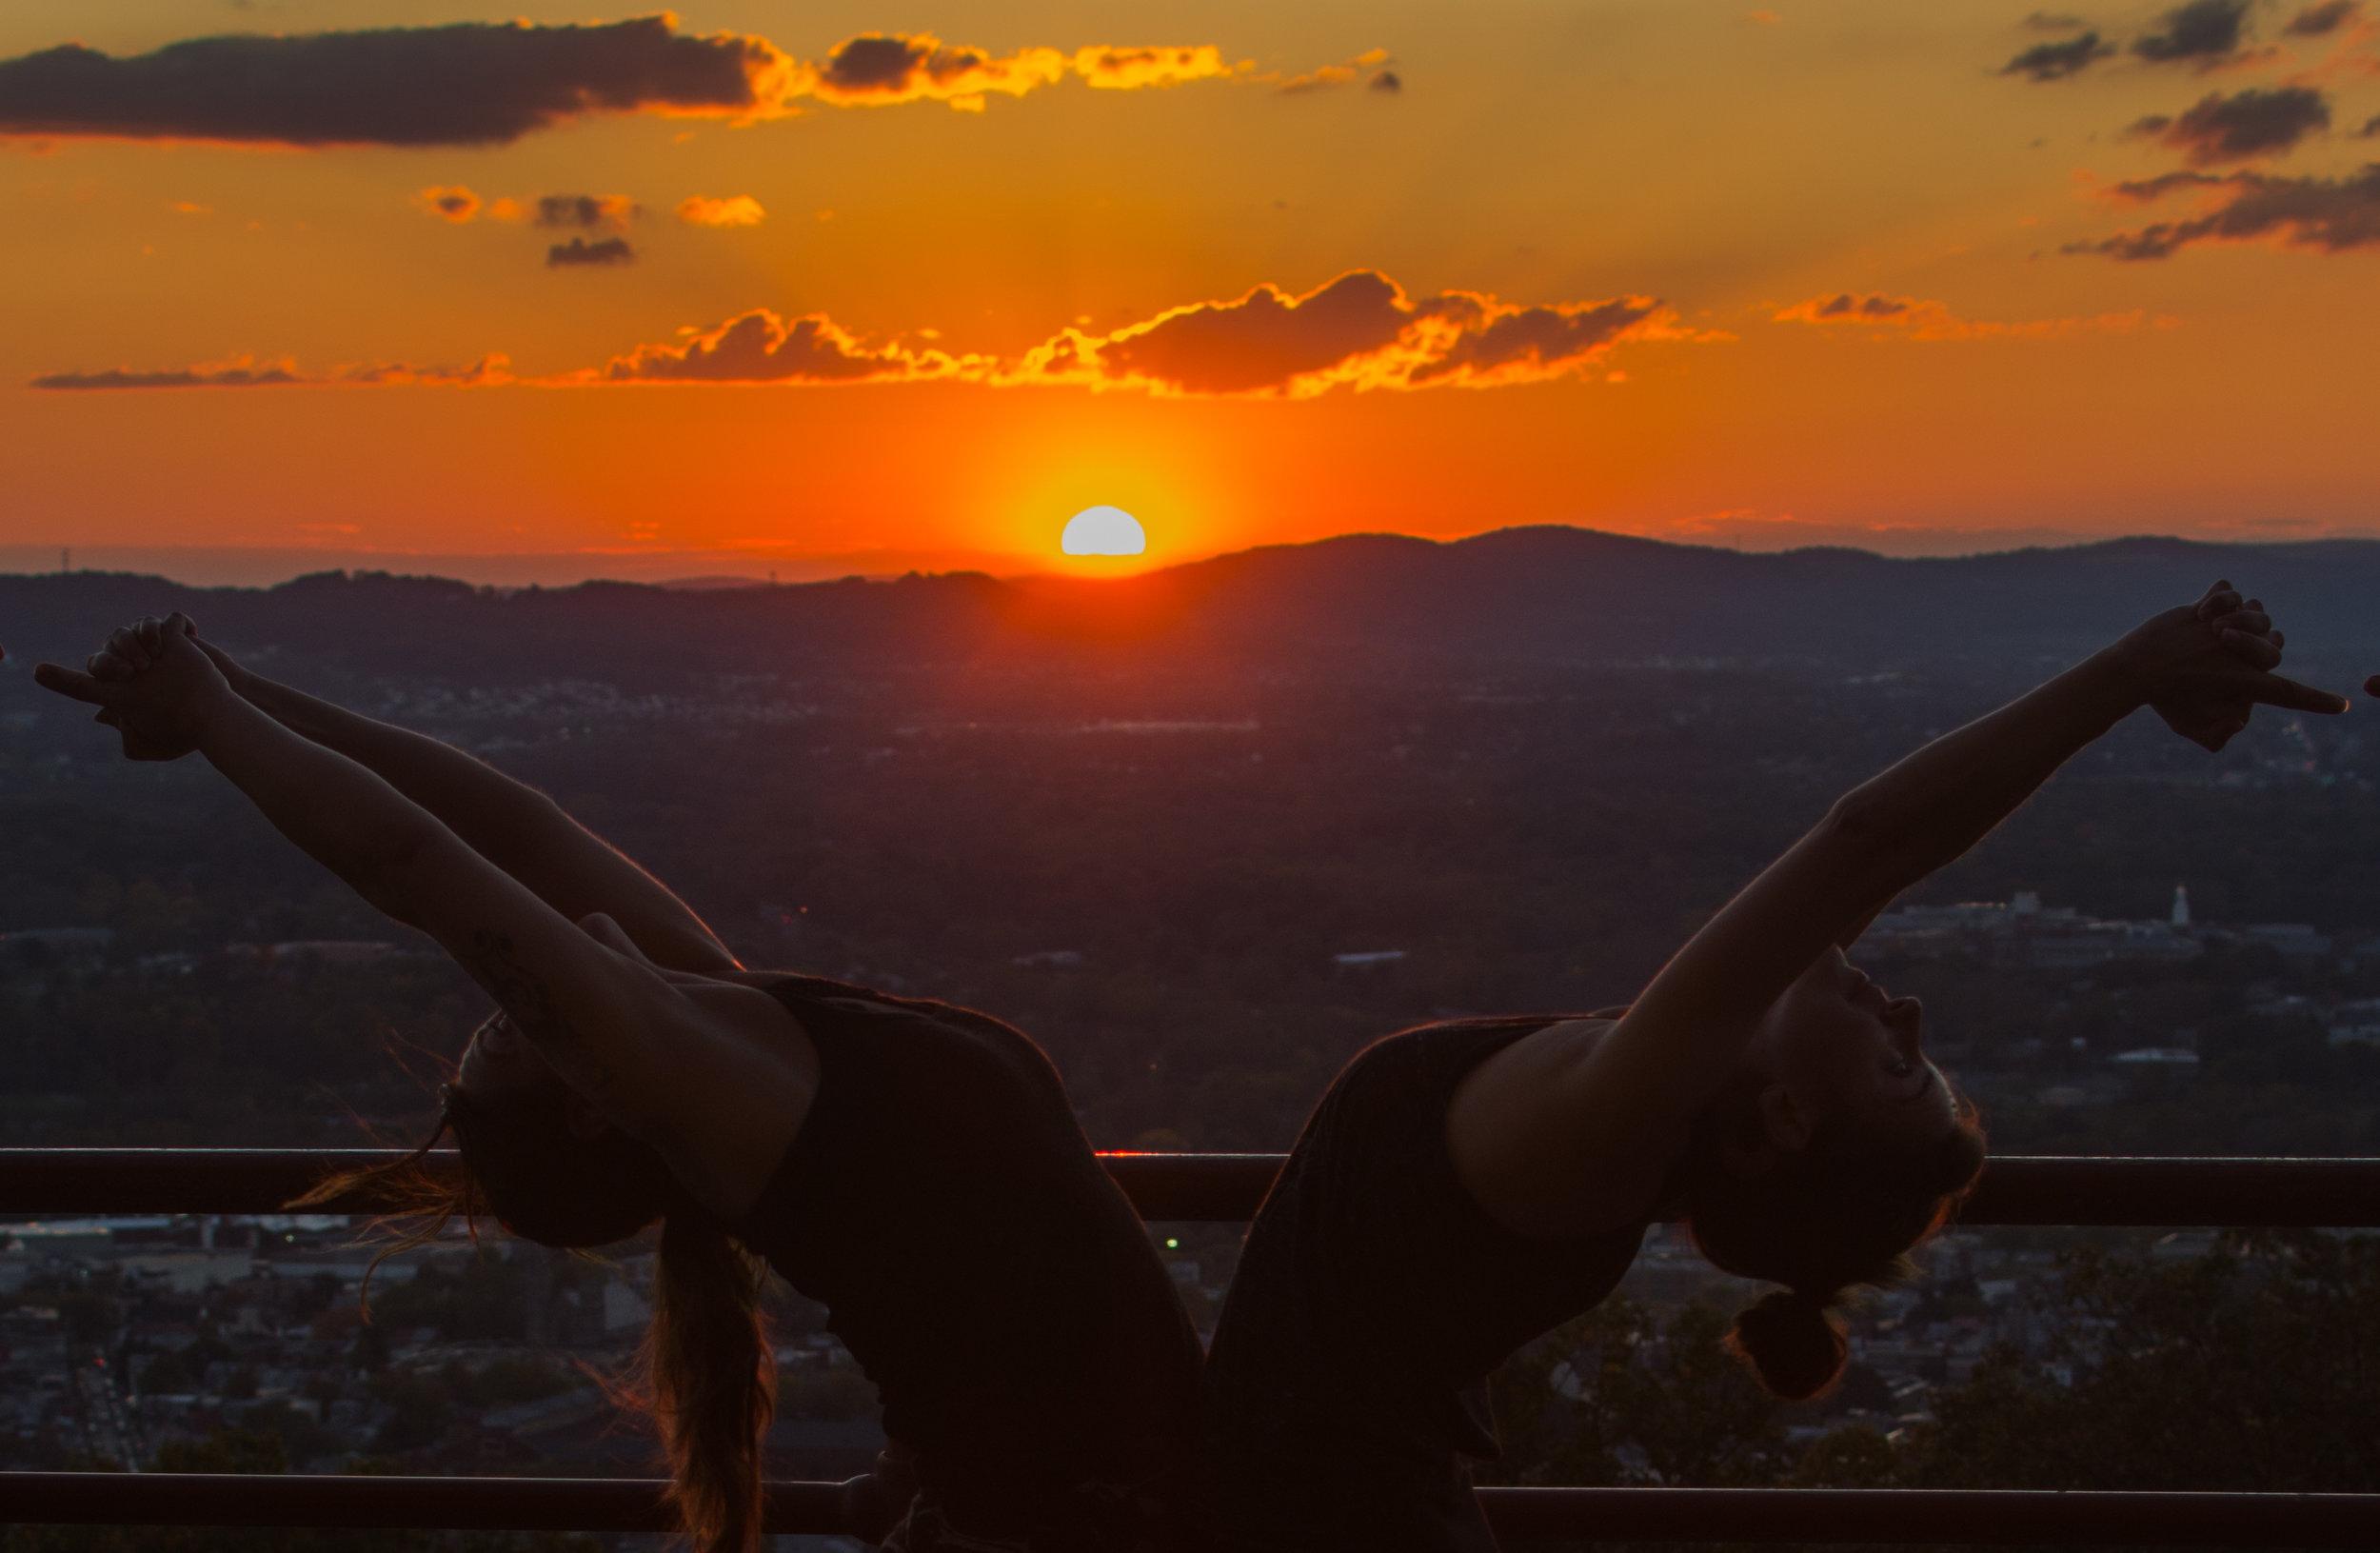 bikram-yoga-west-reading-community-class-moon.jpg